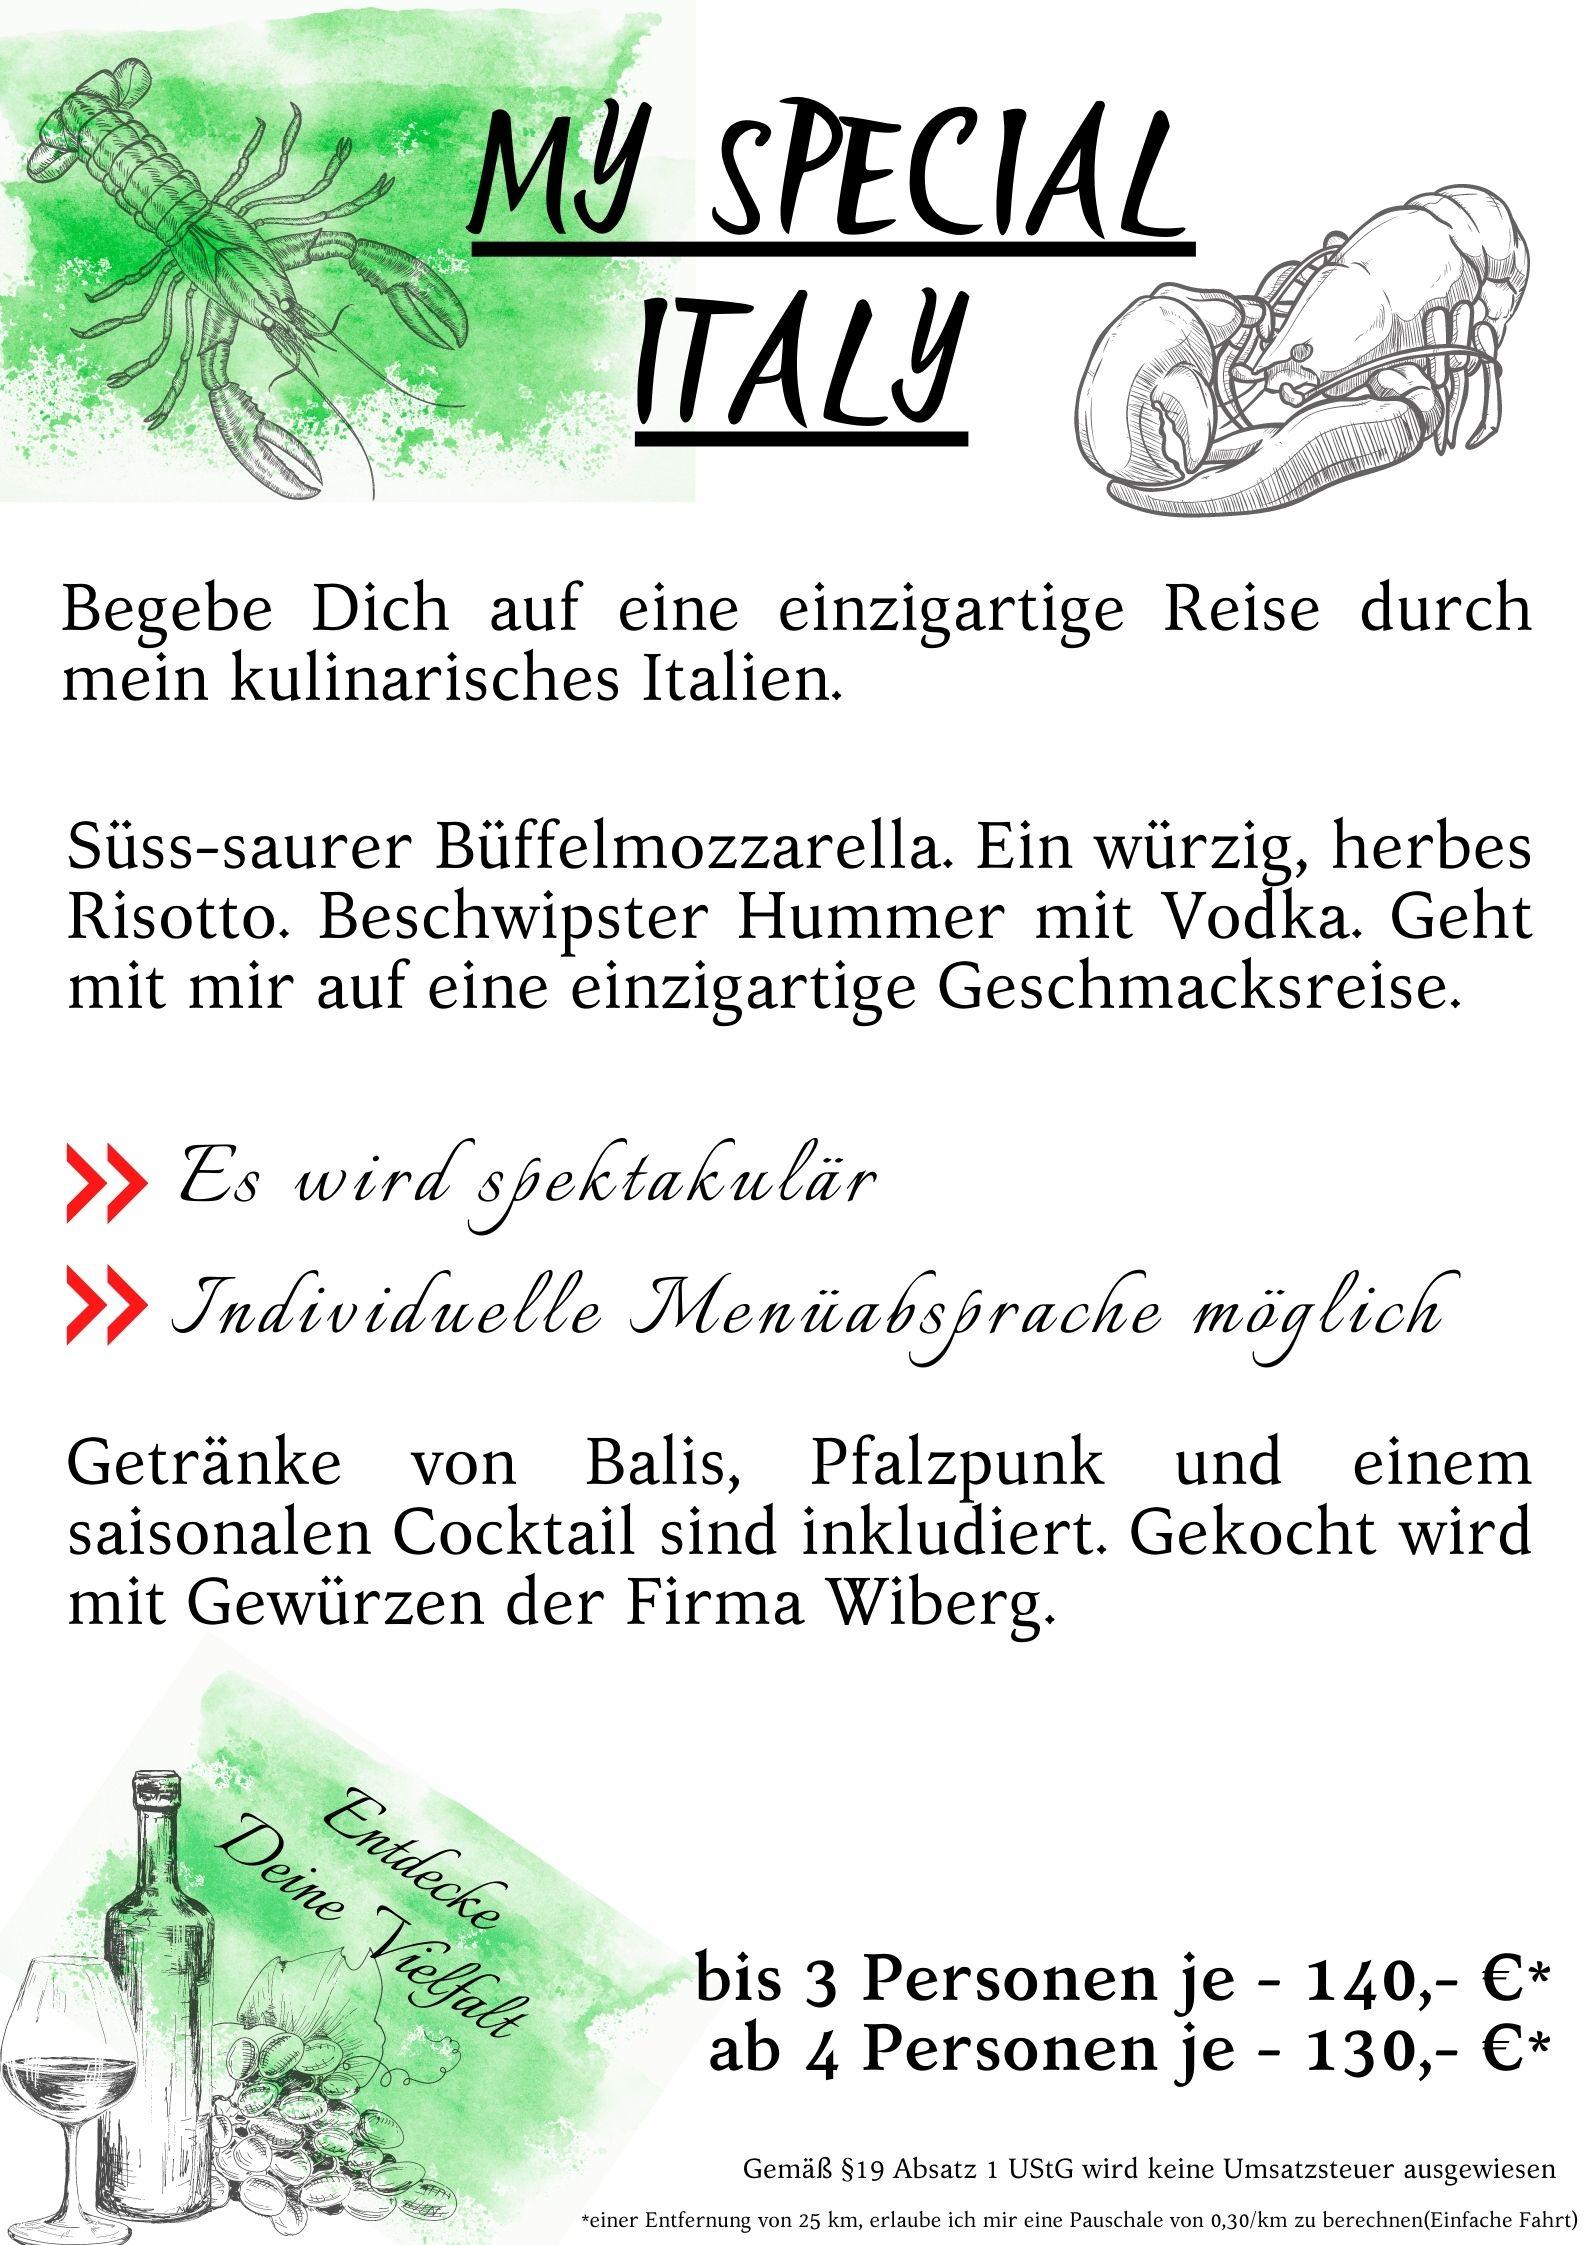 Home Cooking Hofmann. Ludwig Hofmann. Kochkurse. Regionaler Kochkurs. Saisonaler Kochkurs. Italienischer Kochkurs. Thailändischer Kochkurs. München. Rosenheim. Salzburg. Linz, Kochkurse München. Kochkurse Rosenheim. Kochkurse Salzburg. Kochkurse Linz.